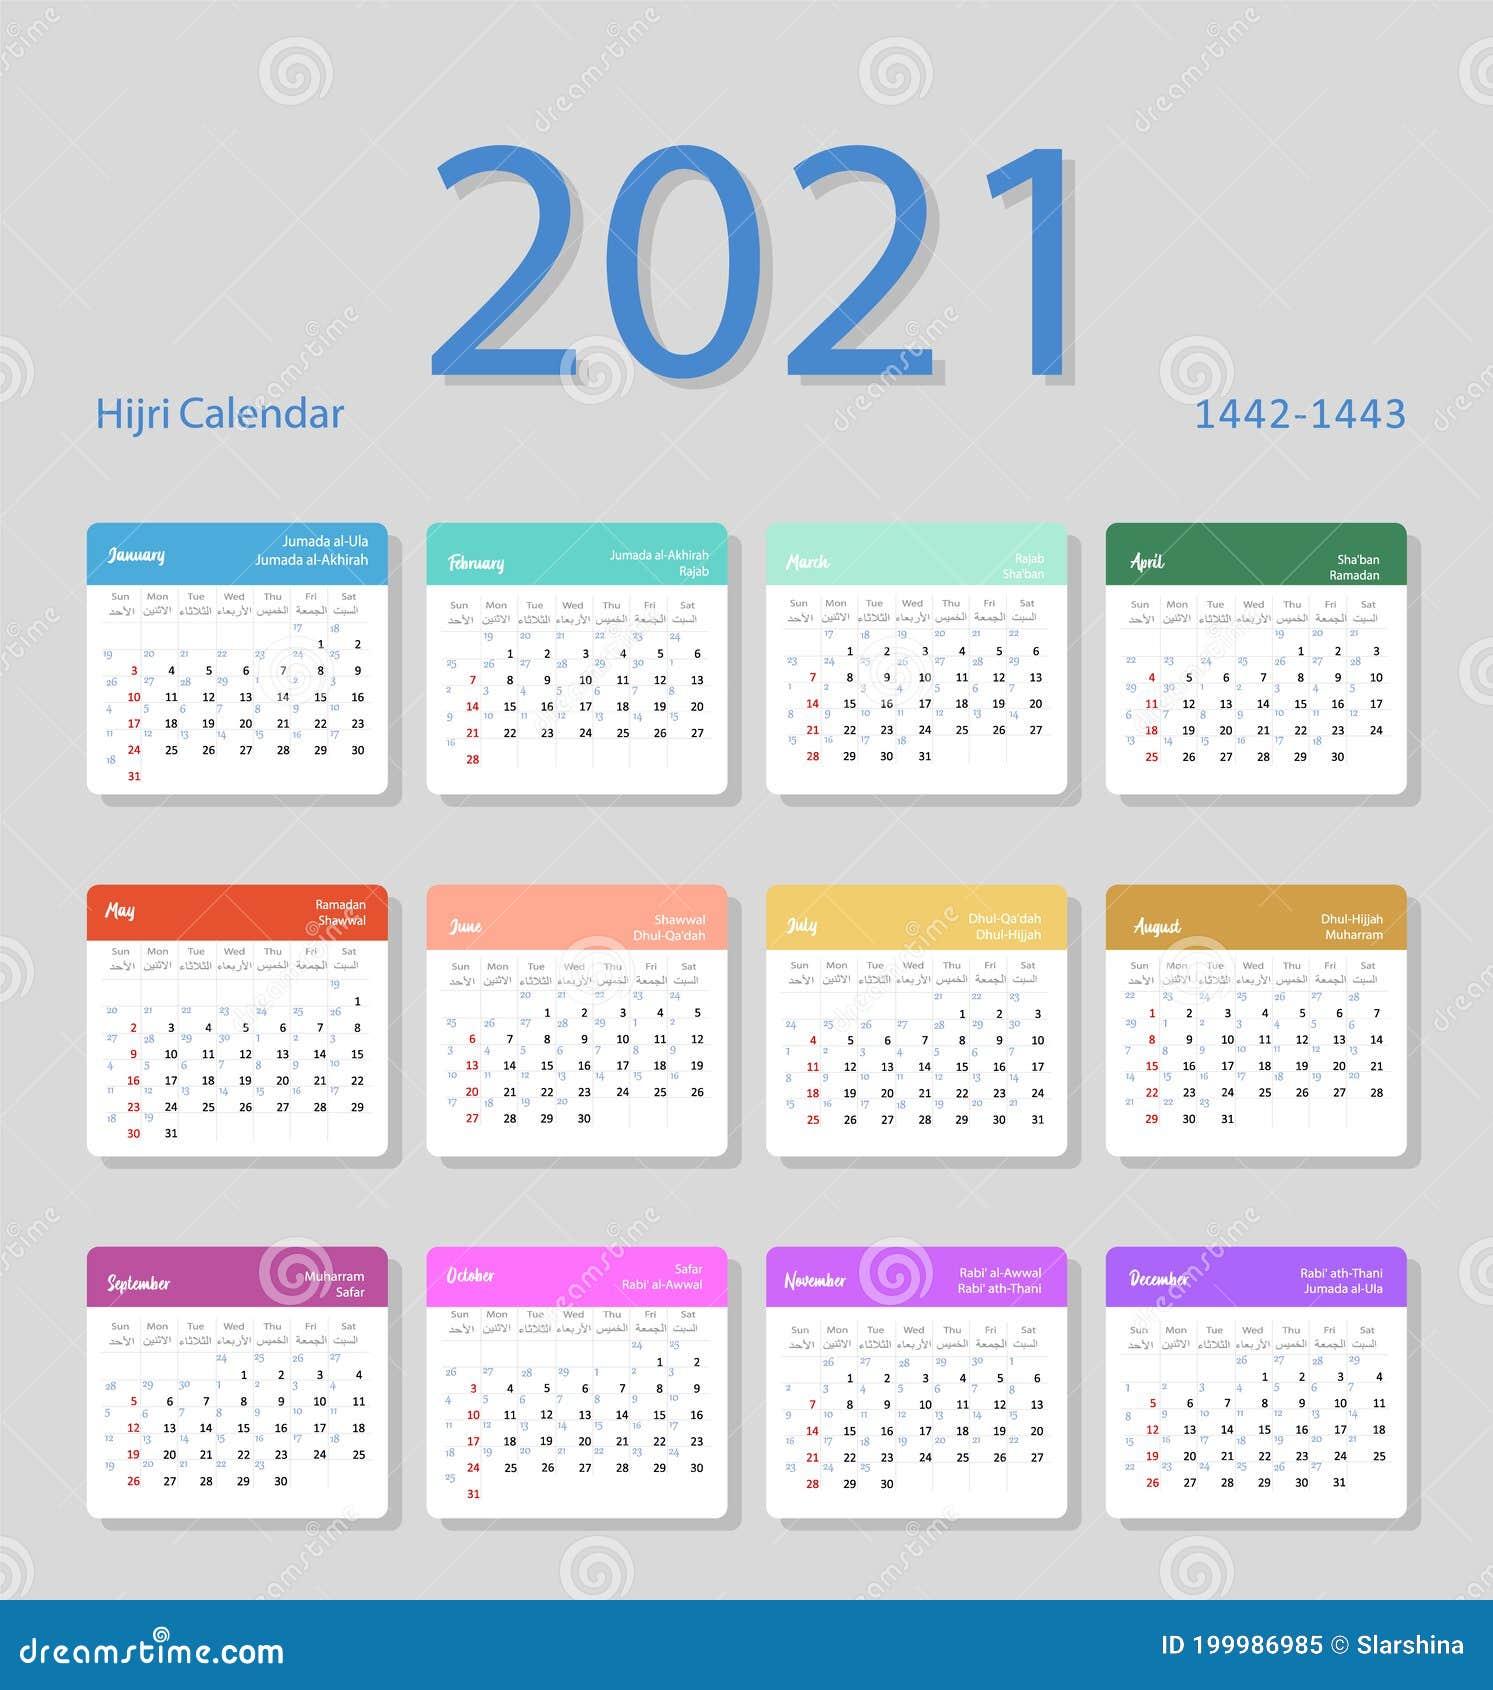 Hijri Calendar 2022.Hijri Calendar Stock Illustrations 981 Hijri Calendar Stock Illustrations Vectors Clipart Dreamstime